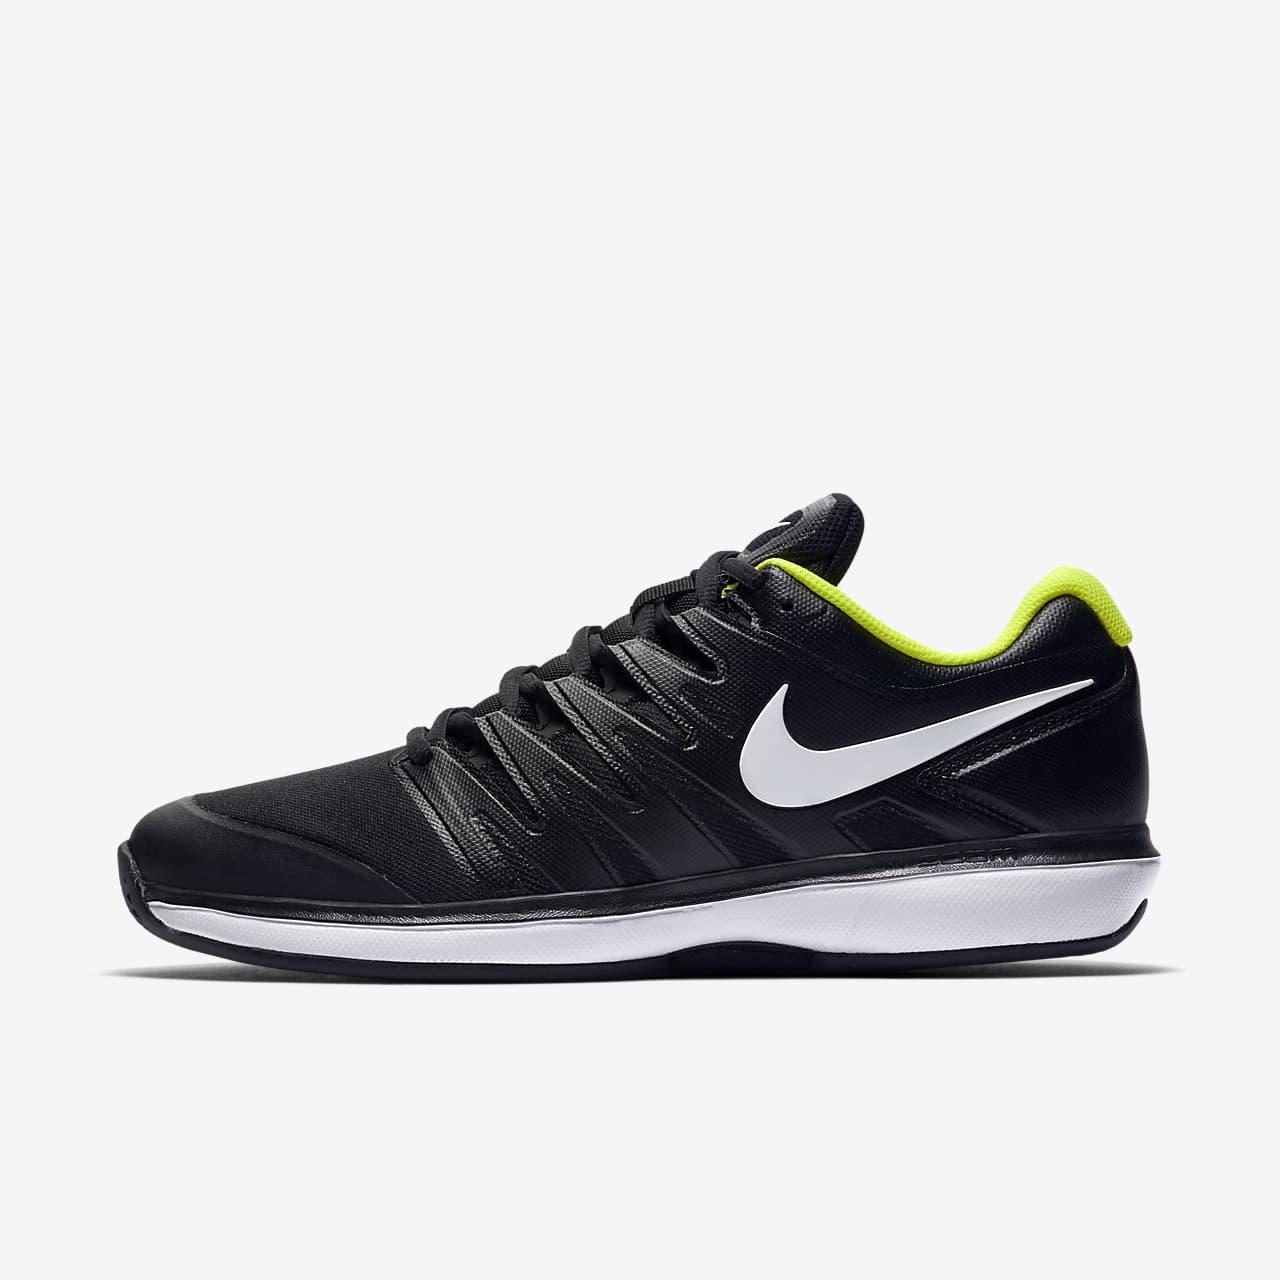 NikeCourt Air Zoom Prestige Men's Clay